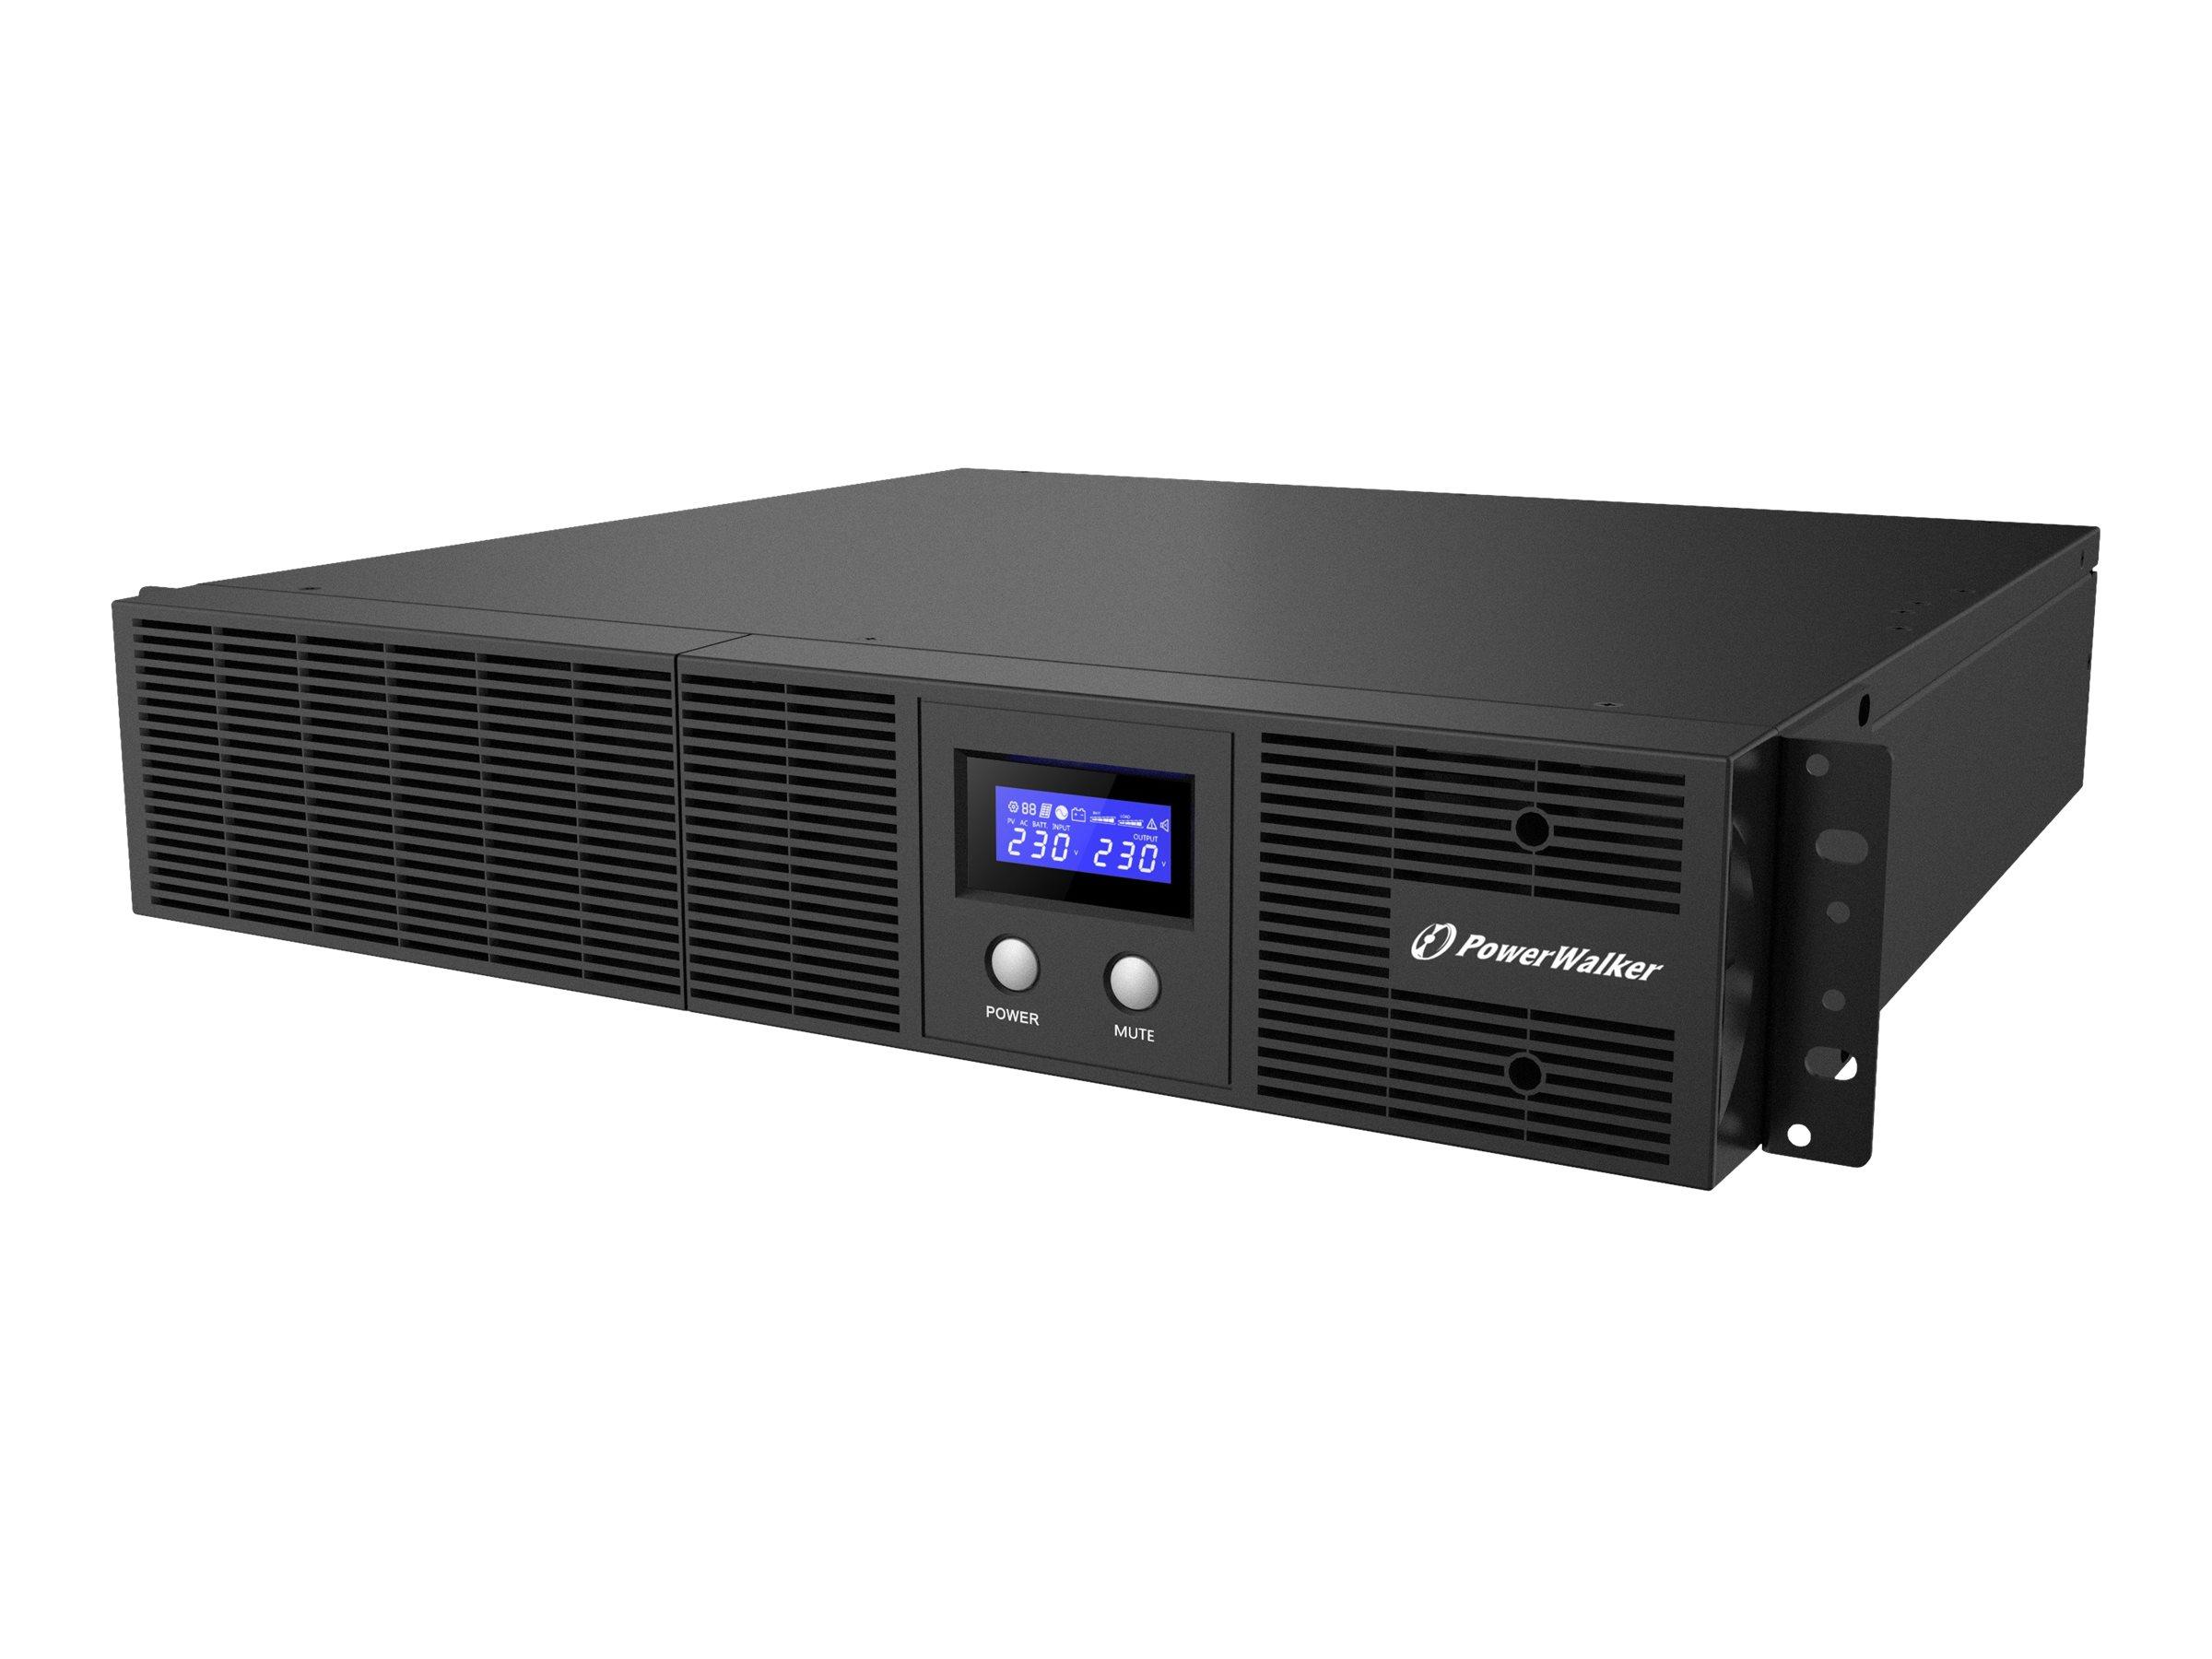 PowerWalker VI 2200 RLE - USV (Rack - einbaufähig) - Wechselstrom 230 V - 1320 Watt - 2200 VA 9 Ah